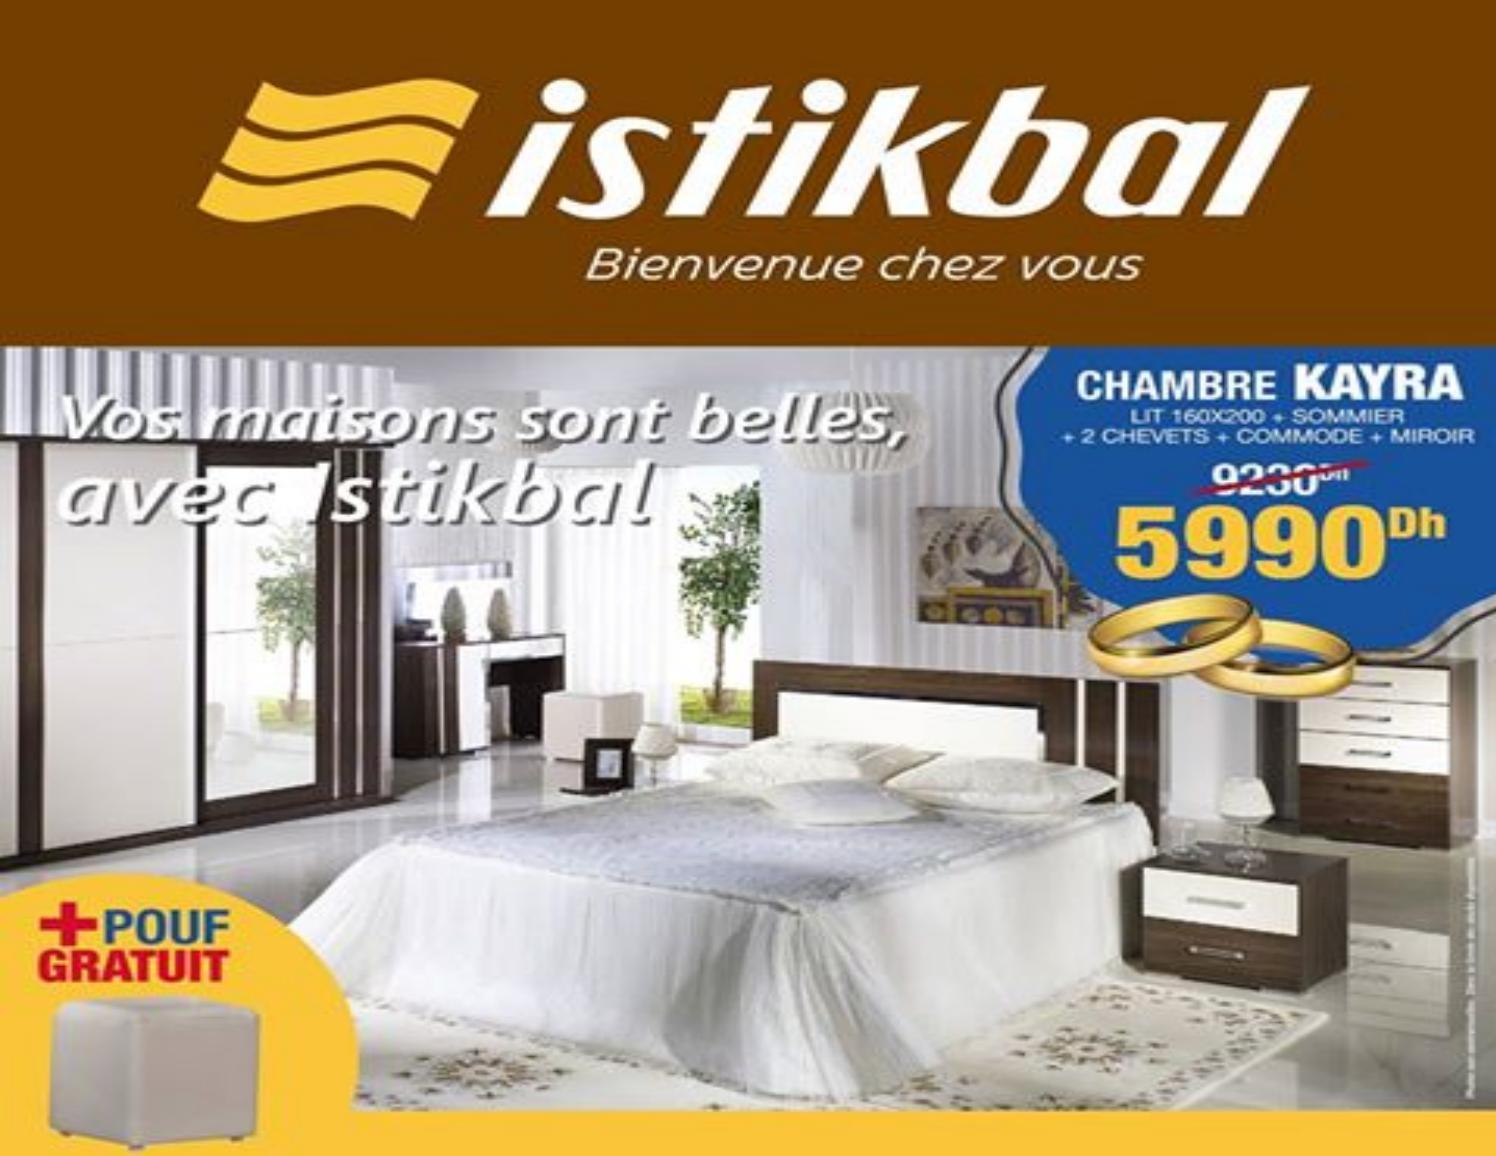 Catalogue Istikbal été 2016 Promotion Au Maroc By Simo   Issuu